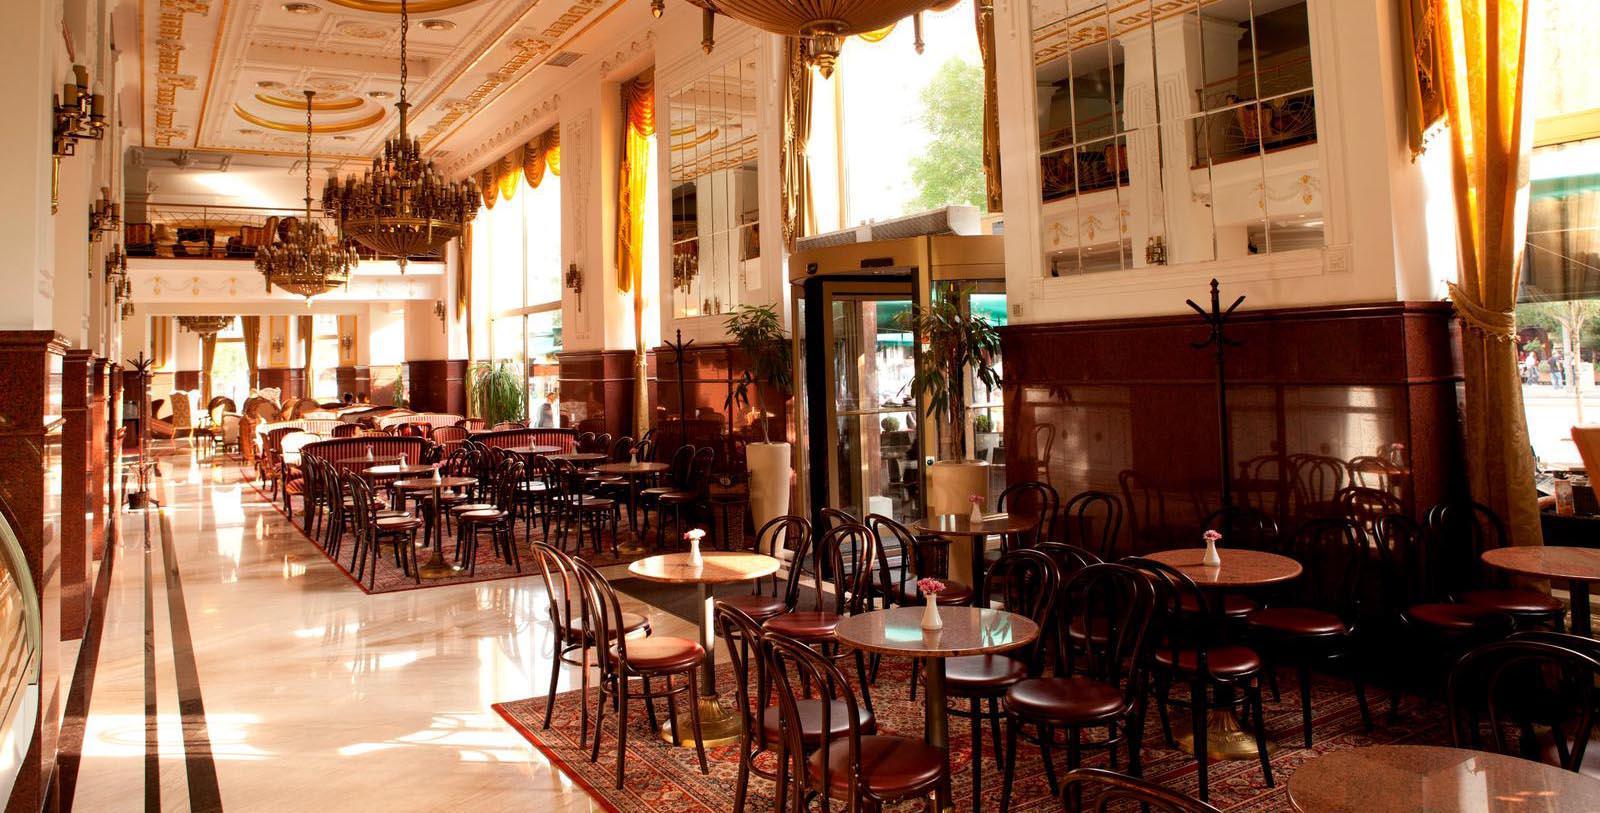 Image of Dining Room, Hotel Moskva, Belgrade, Sebia, 1908, Member of Historic Hotels Worldwide, Dining